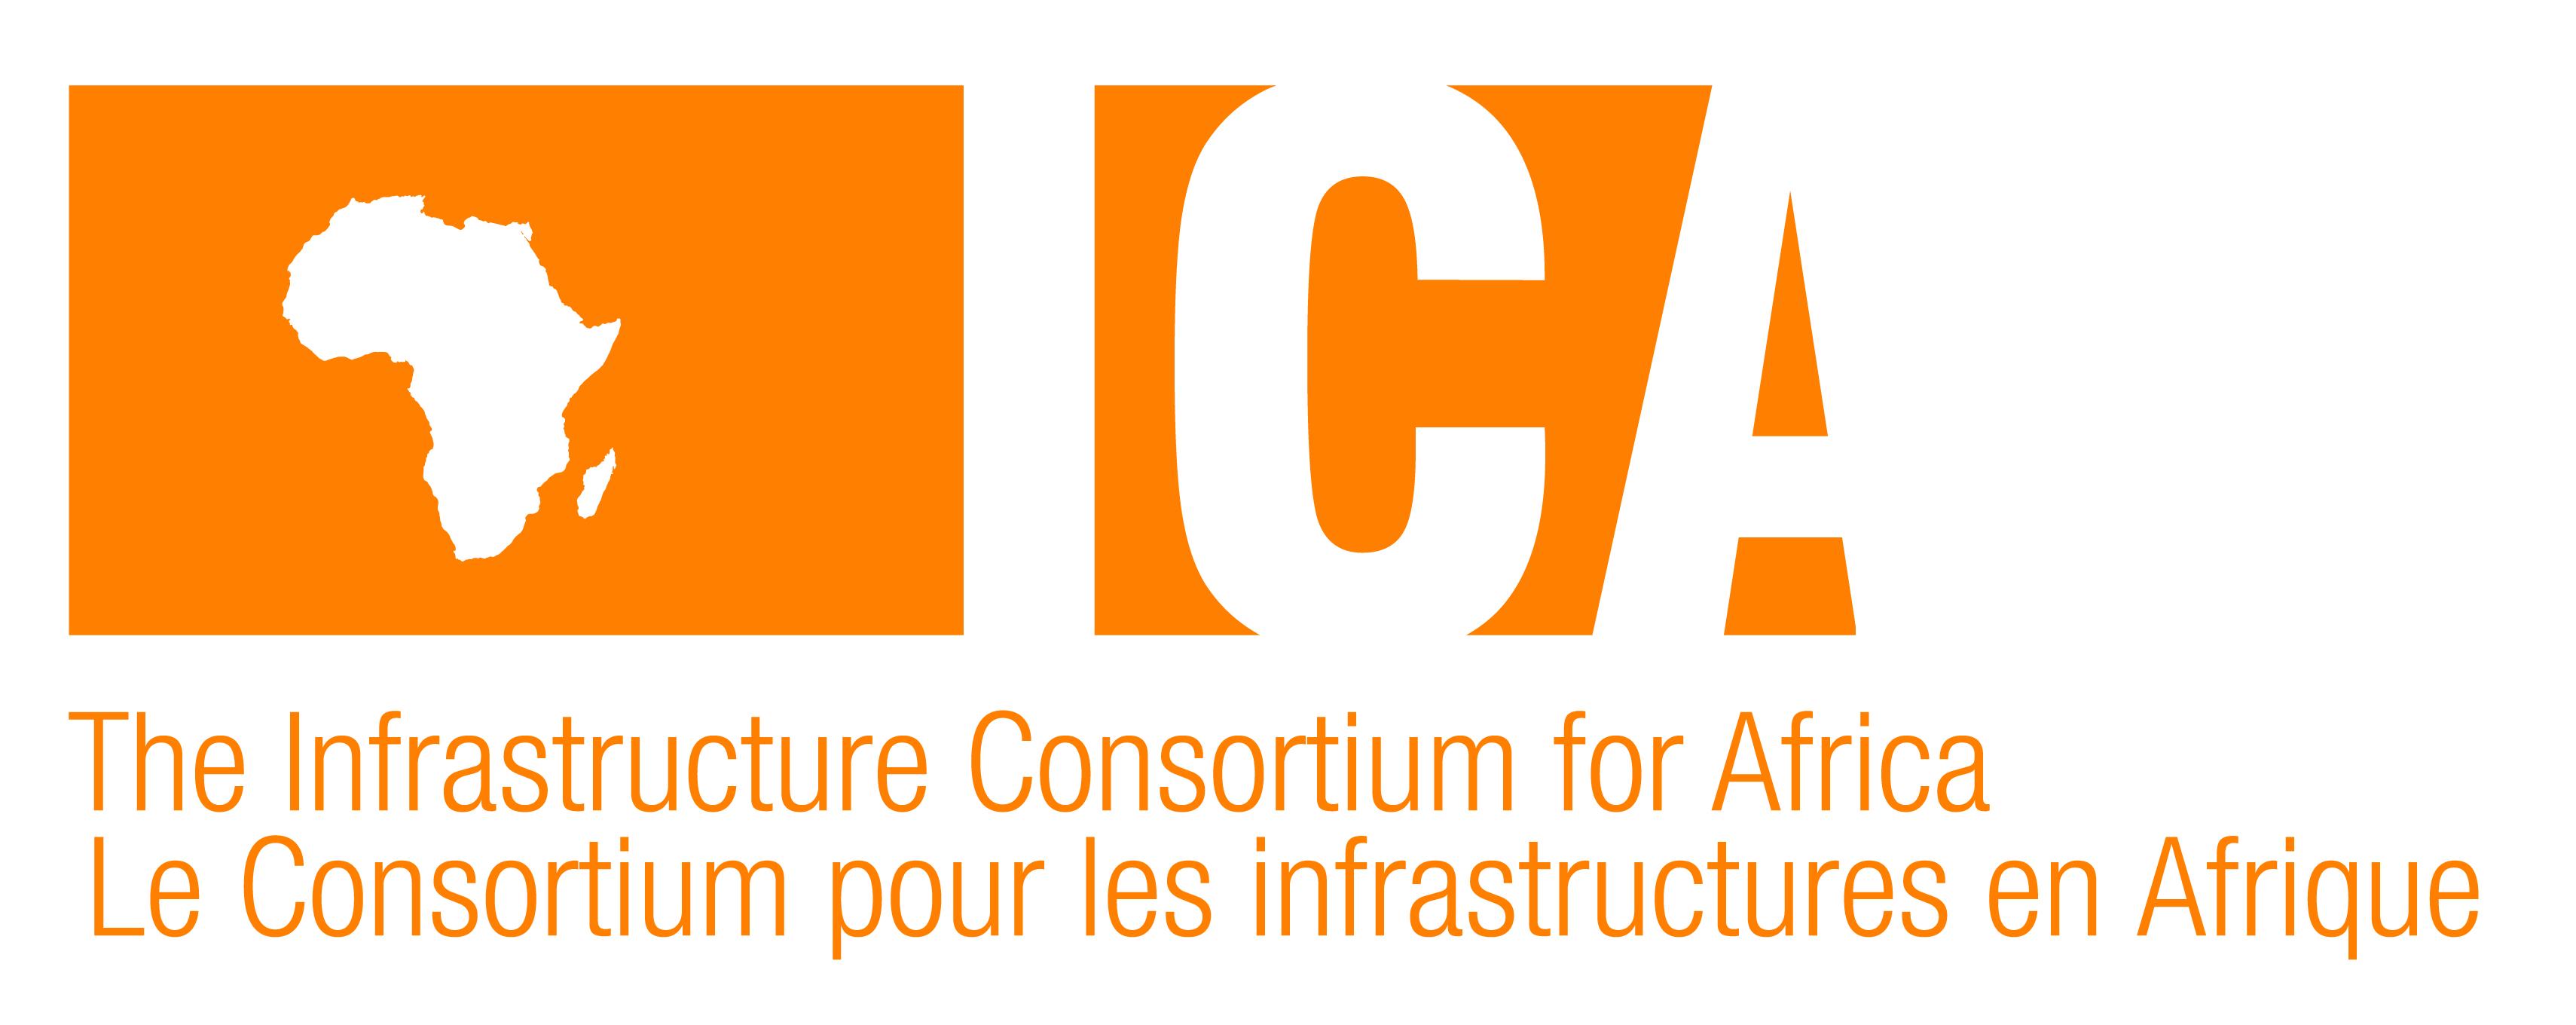 logo for Infrastructure Consortium for Africa